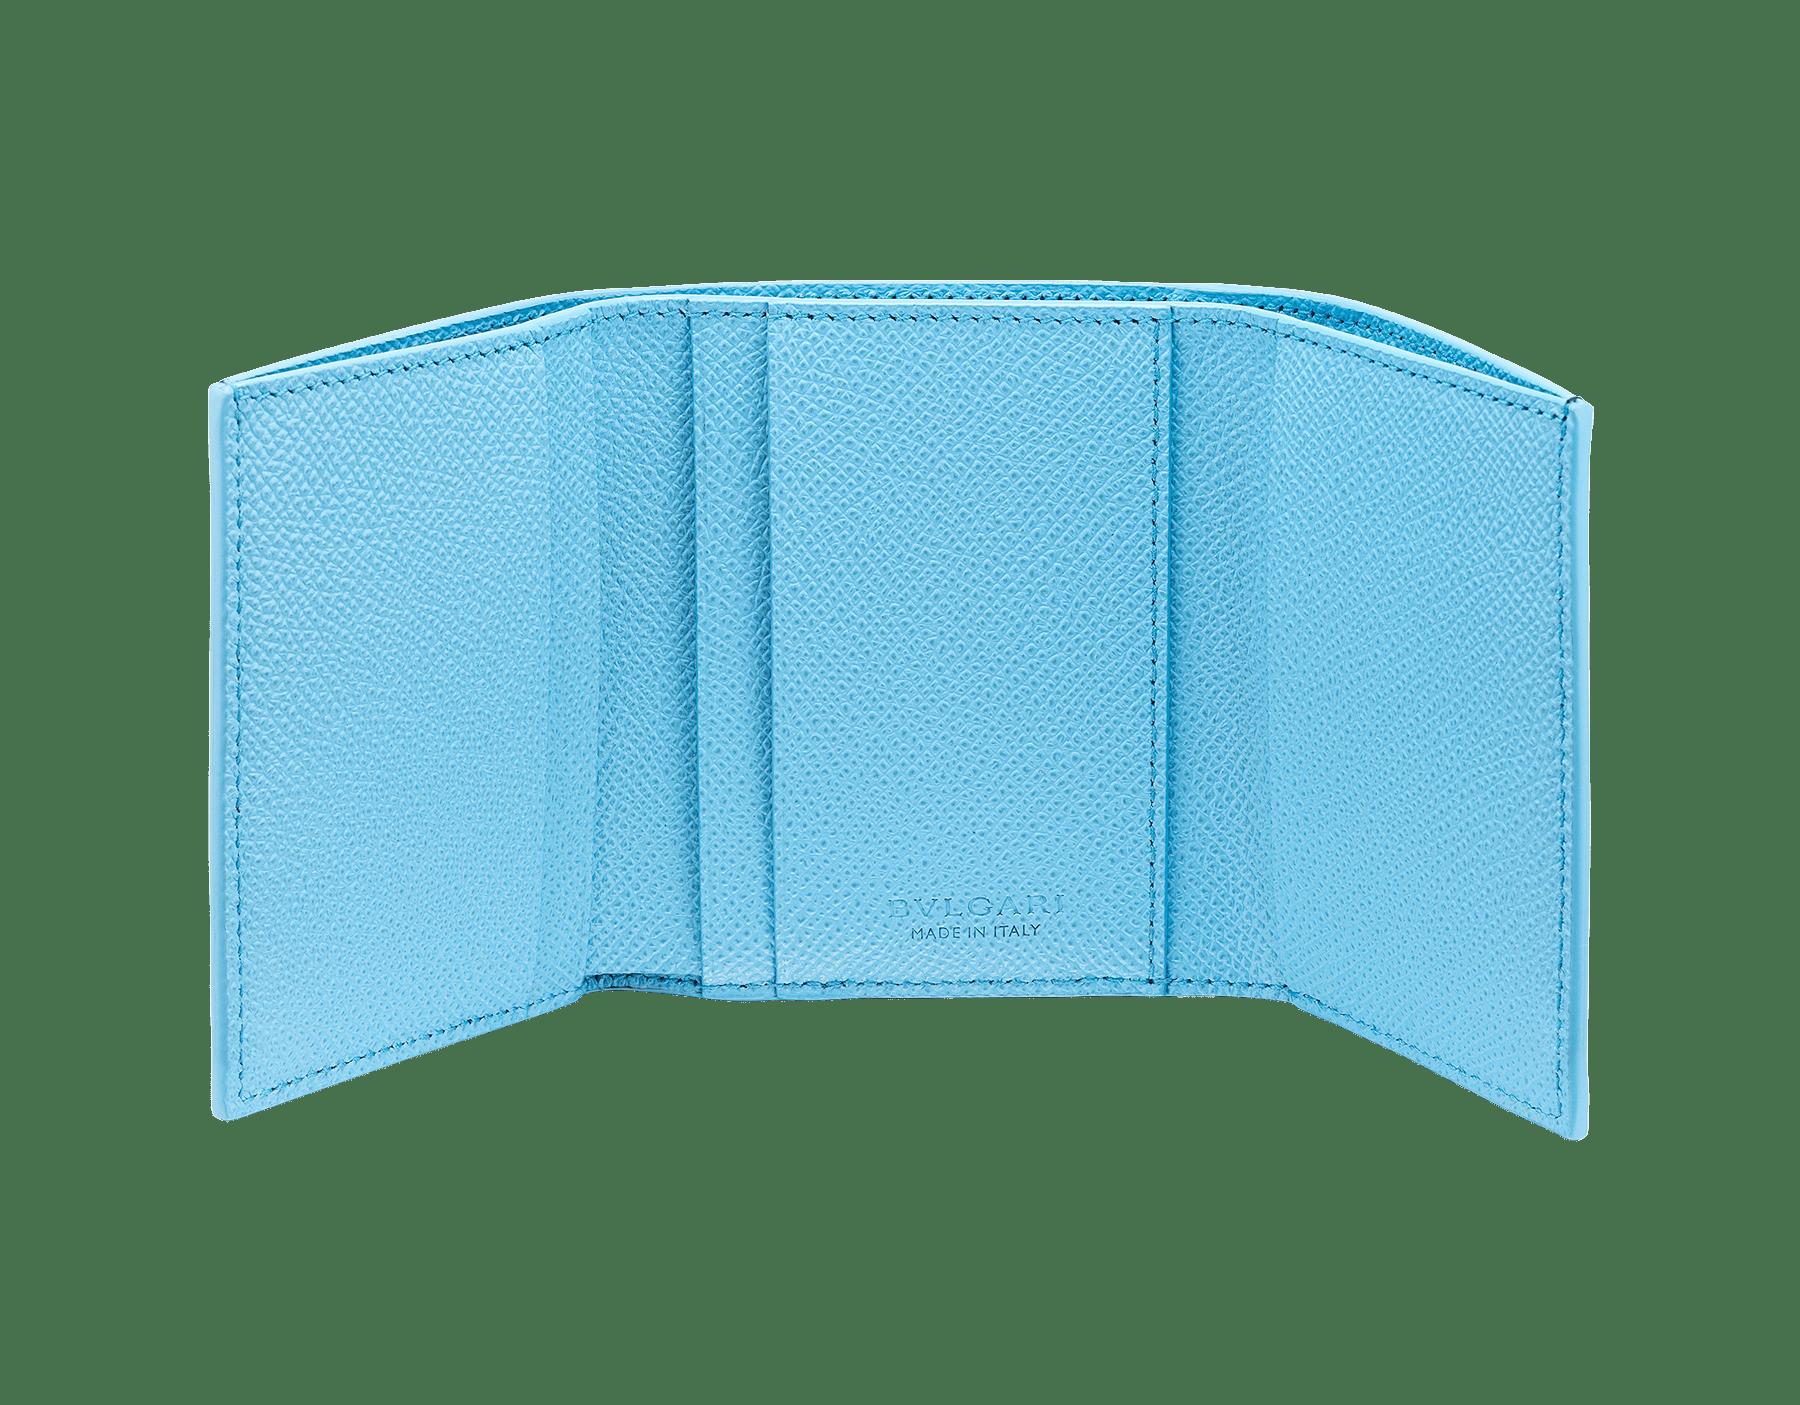 """Bvlgari Clip"" slim compact wallet in Denim Sapphire blue and Aegean Topaz light blue grained calfskin. Iconiclogo clip closure in palladium-plated brass BCM-SLIMCOMPACTa image 2"